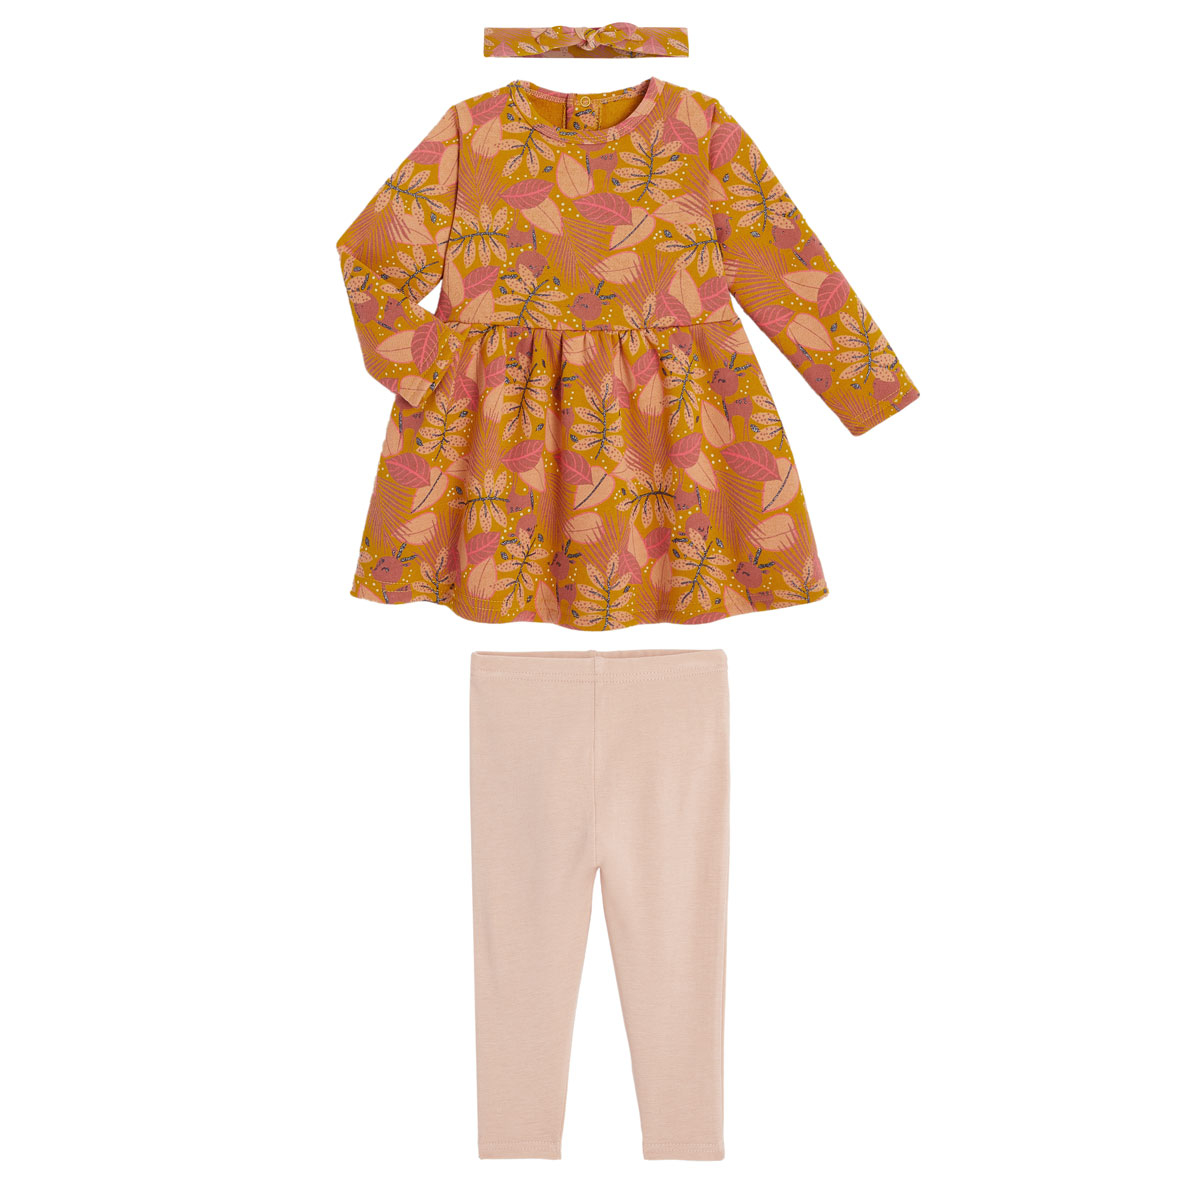 Robe fille en molleton, legging et bandeau contenant du coton bio Papaye